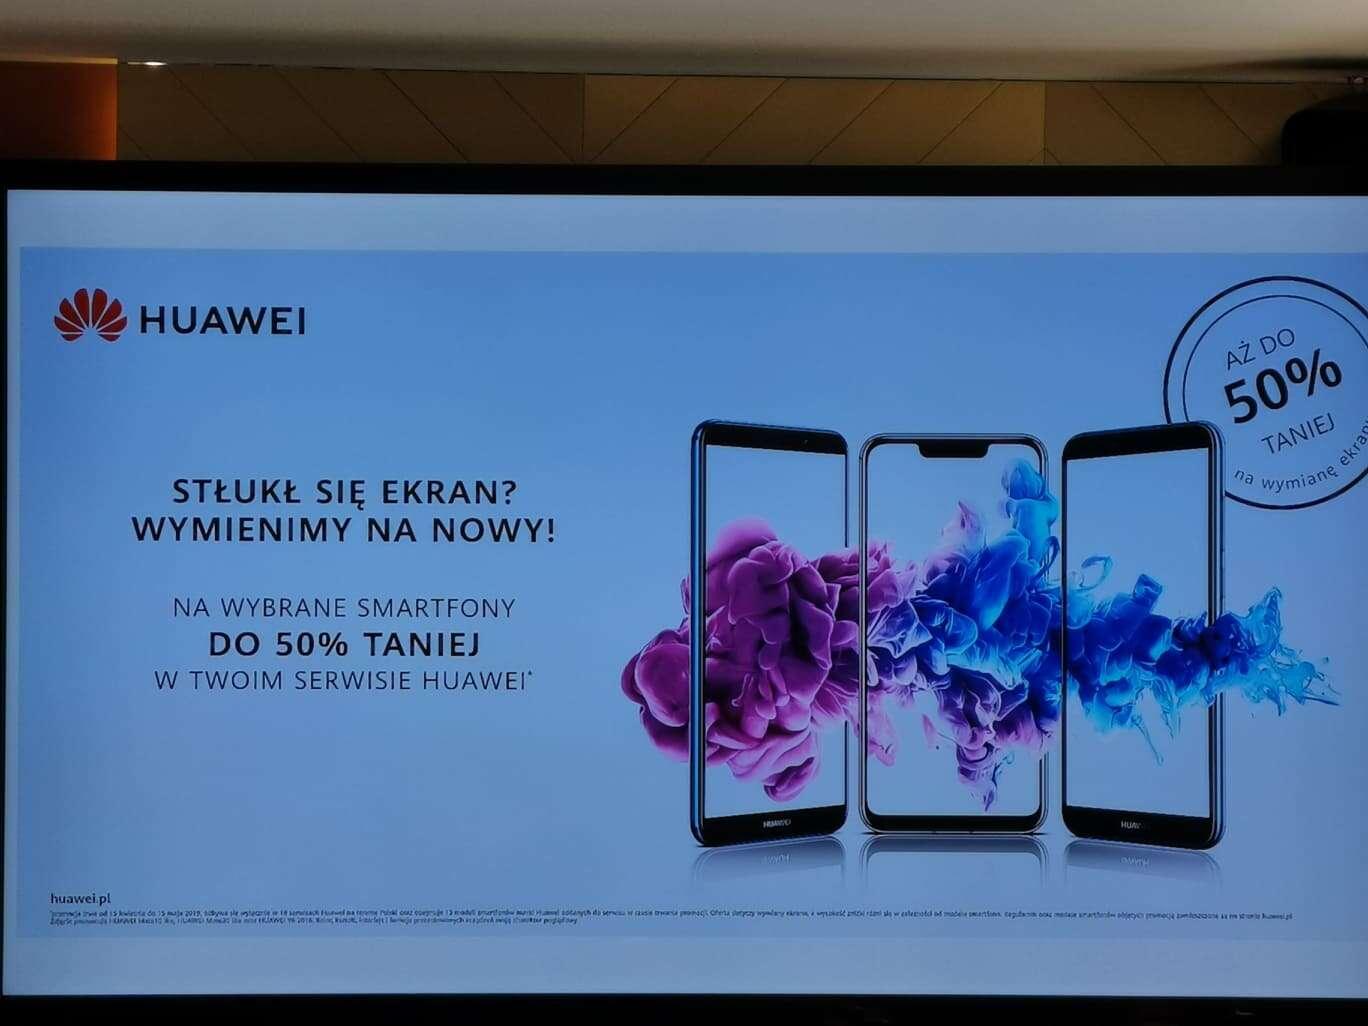 Huawei P30 Lite, parametry Huawei P30 Lite, cena Huawei P30 Lite, przedsprzedaż Huawei P30 Lite, premiera Huawei P30 Lite